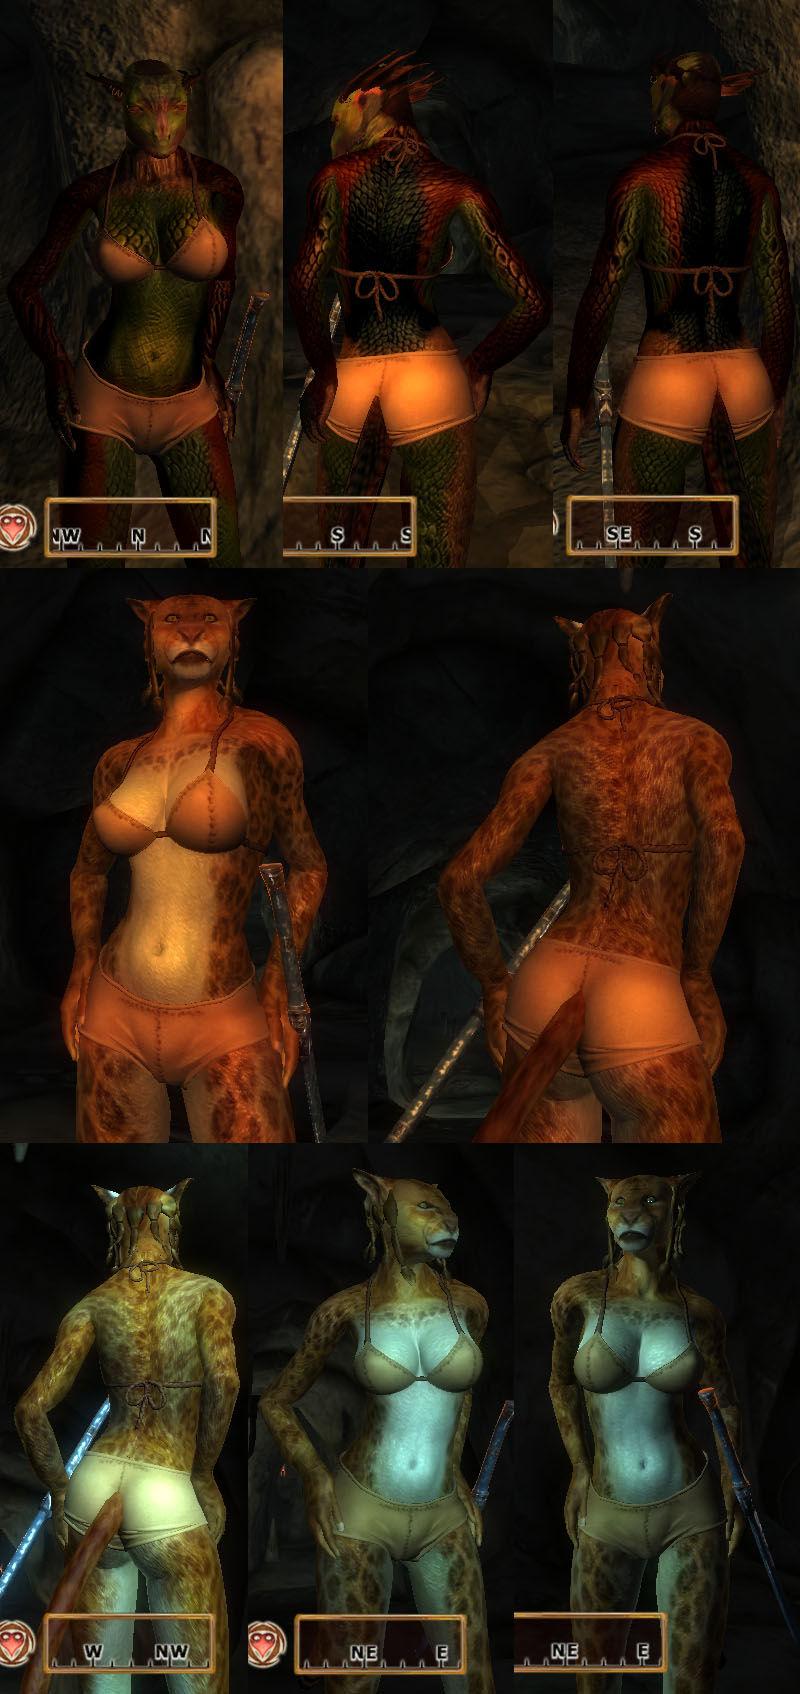 Free hot pussy photos